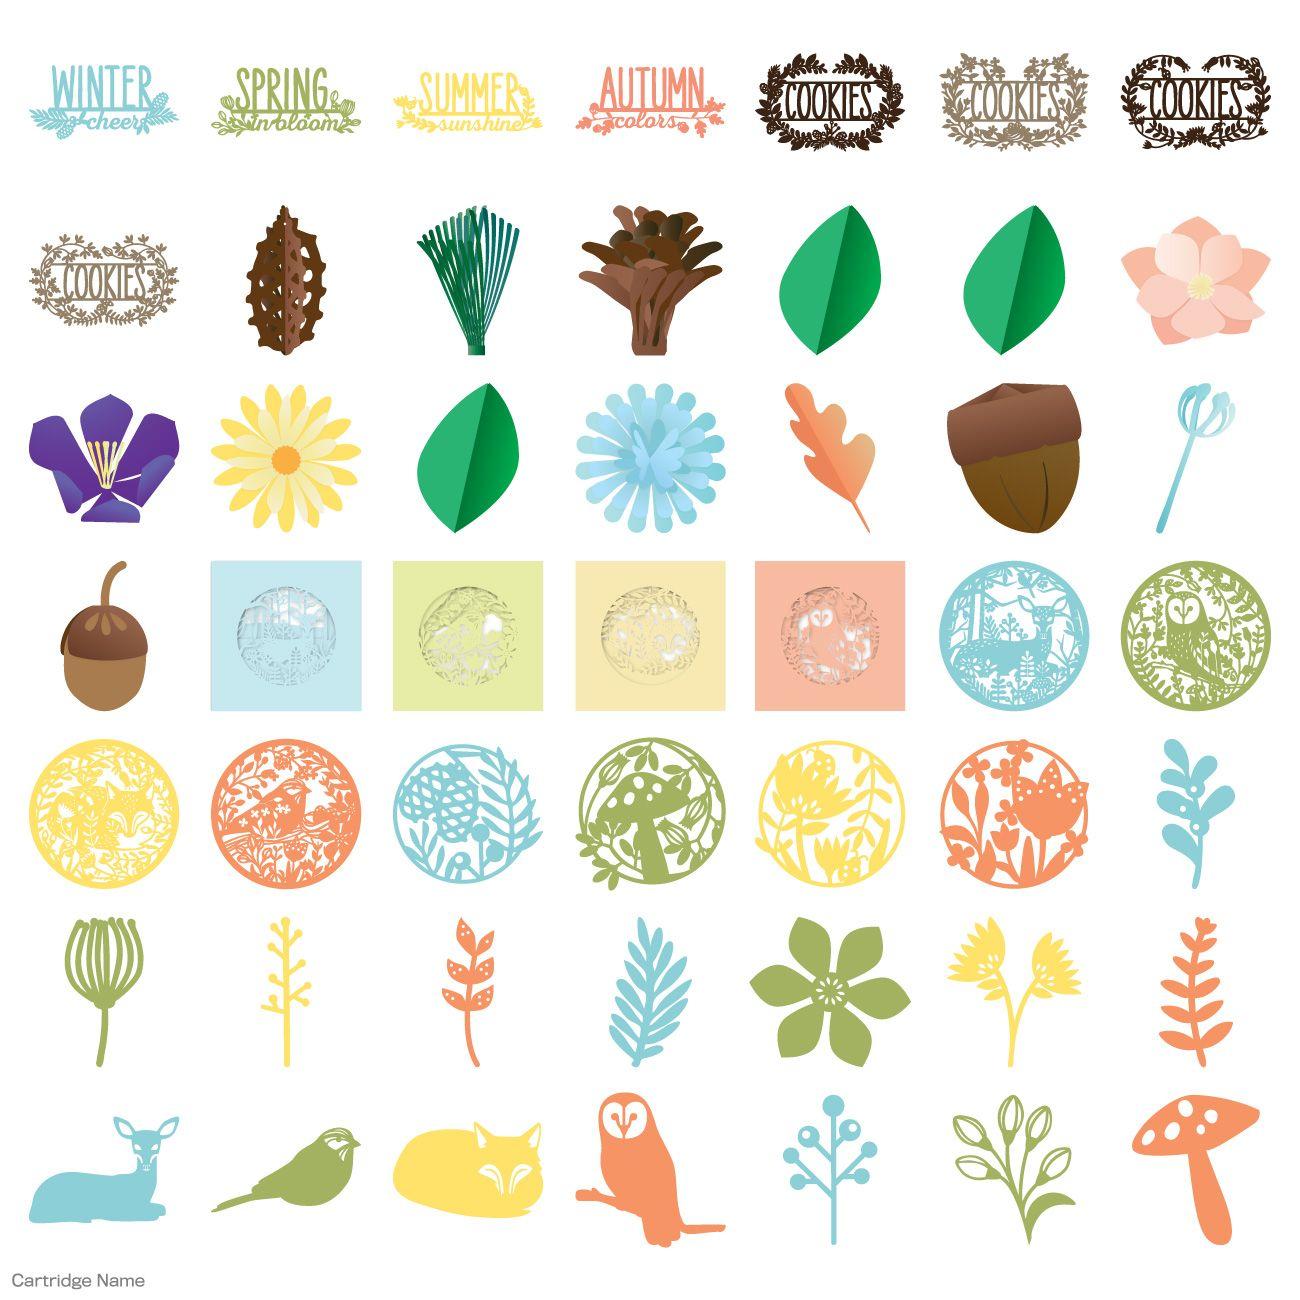 Etonnant Four Seasons Home Decor Cricut® Cartridge By Lia Griffith .